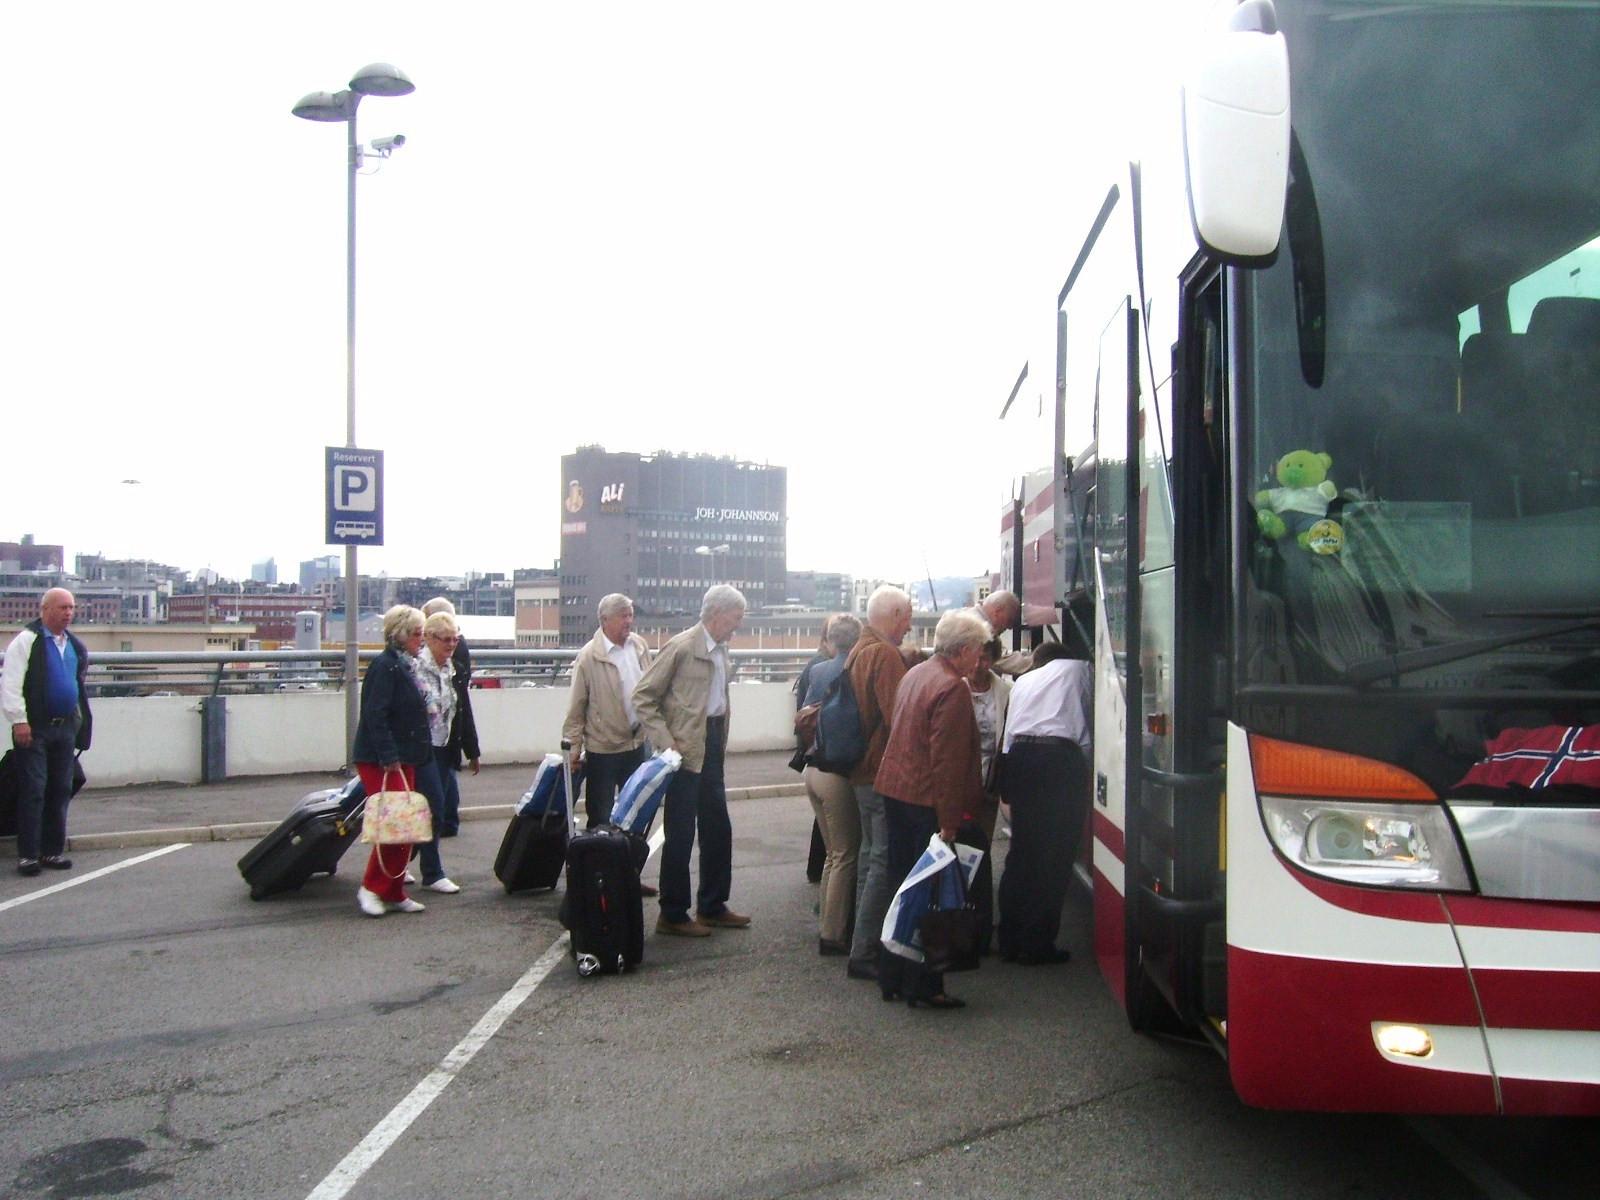 Bilde av Ferge terminalen Oslo.